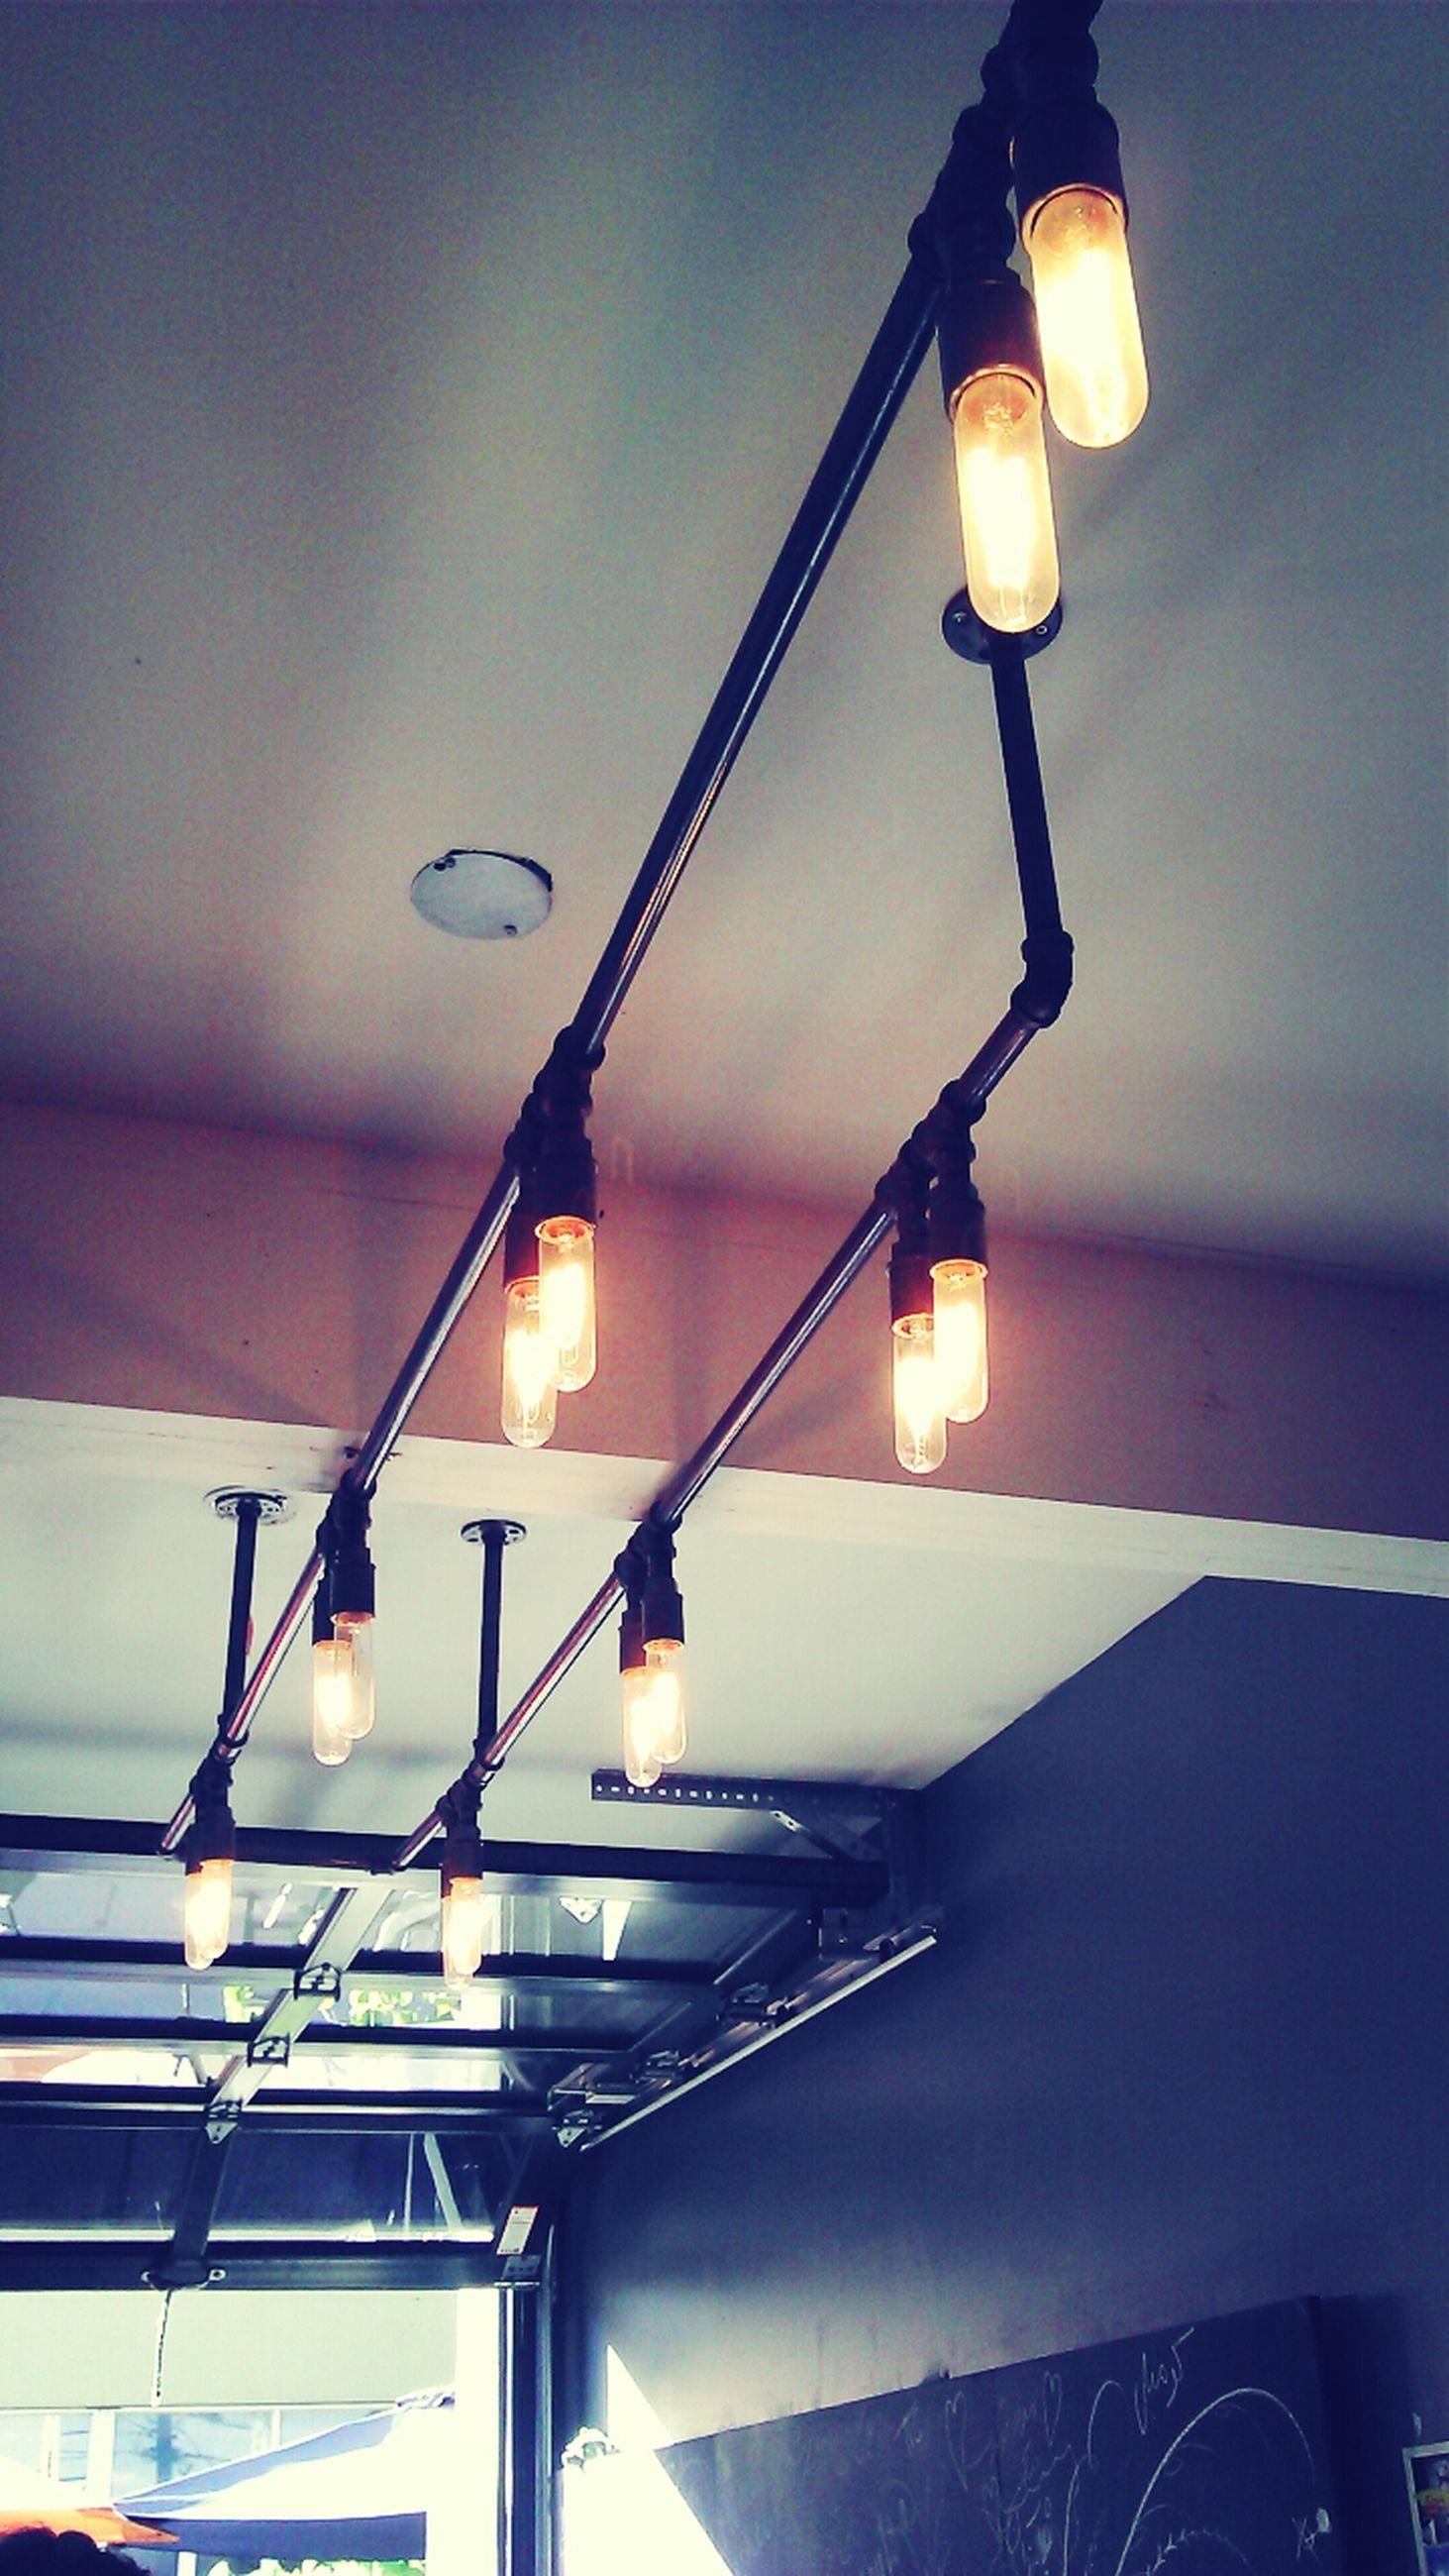 illuminated, lighting equipment, indoors, electricity, electric lamp, hanging, electric light, low angle view, light bulb, lamp, glowing, ceiling, lit, light - natural phenomenon, decoration, lantern, night, street light, home interior, no people